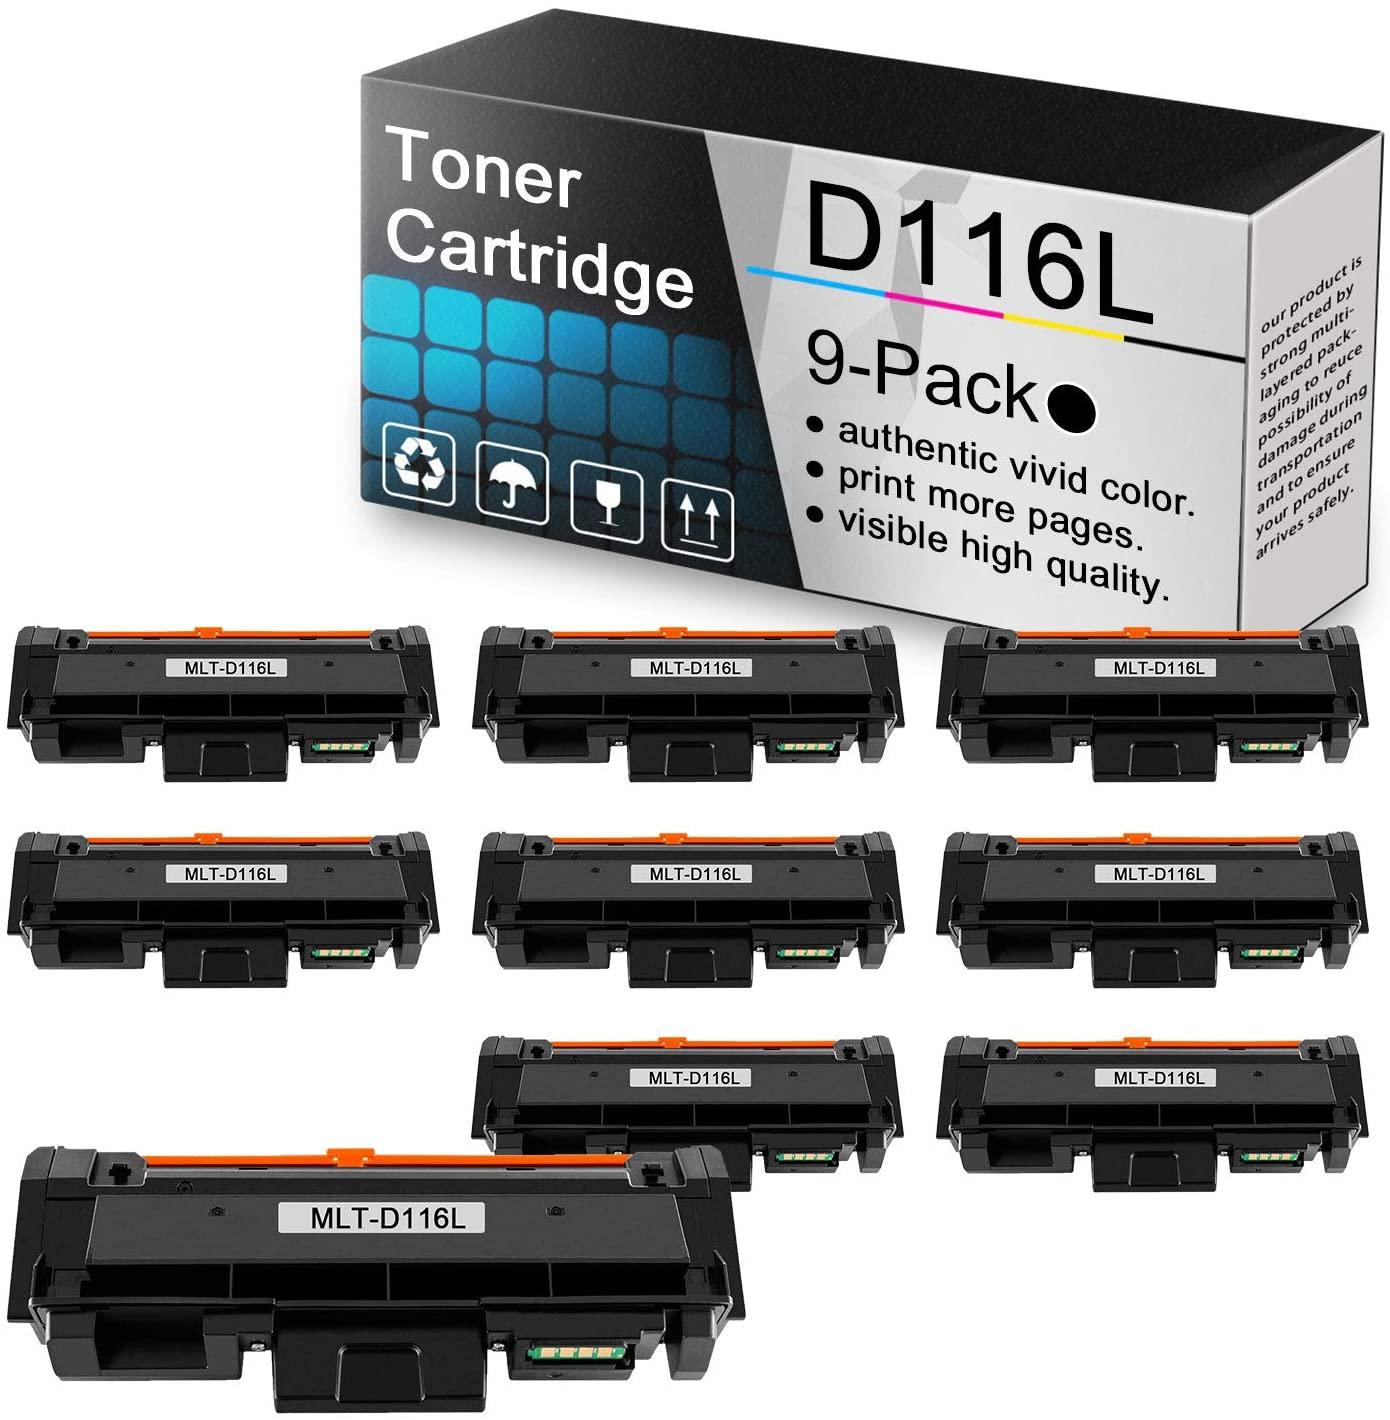 (9 Pack Black Toner Cartridge MLT-D116L) Compatible toner cartridge replacement for Samsung Xpress M2825DW M2825WN M2835 M2675FN M2676FH M2875FW M2875FD M2625D M2626 M288x M262x M267x Series printers.